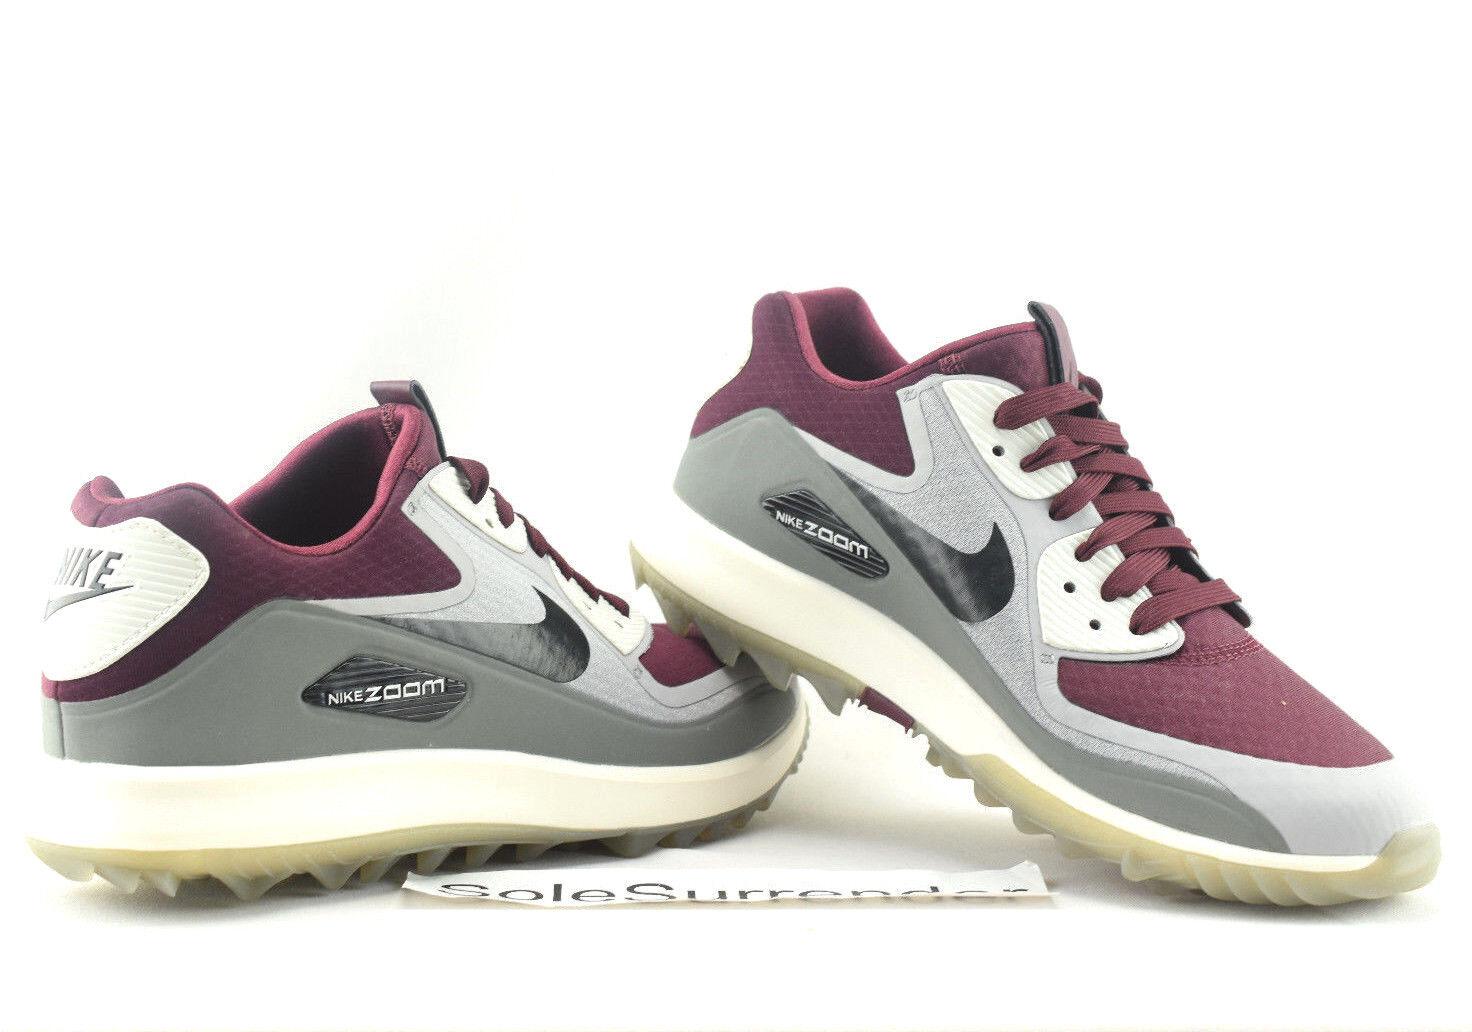 Nike air zum 90 7 - golf - volume 7 90 - 844569-600 rory mcilroy spuntoni amaranto grigio 8d7b8e